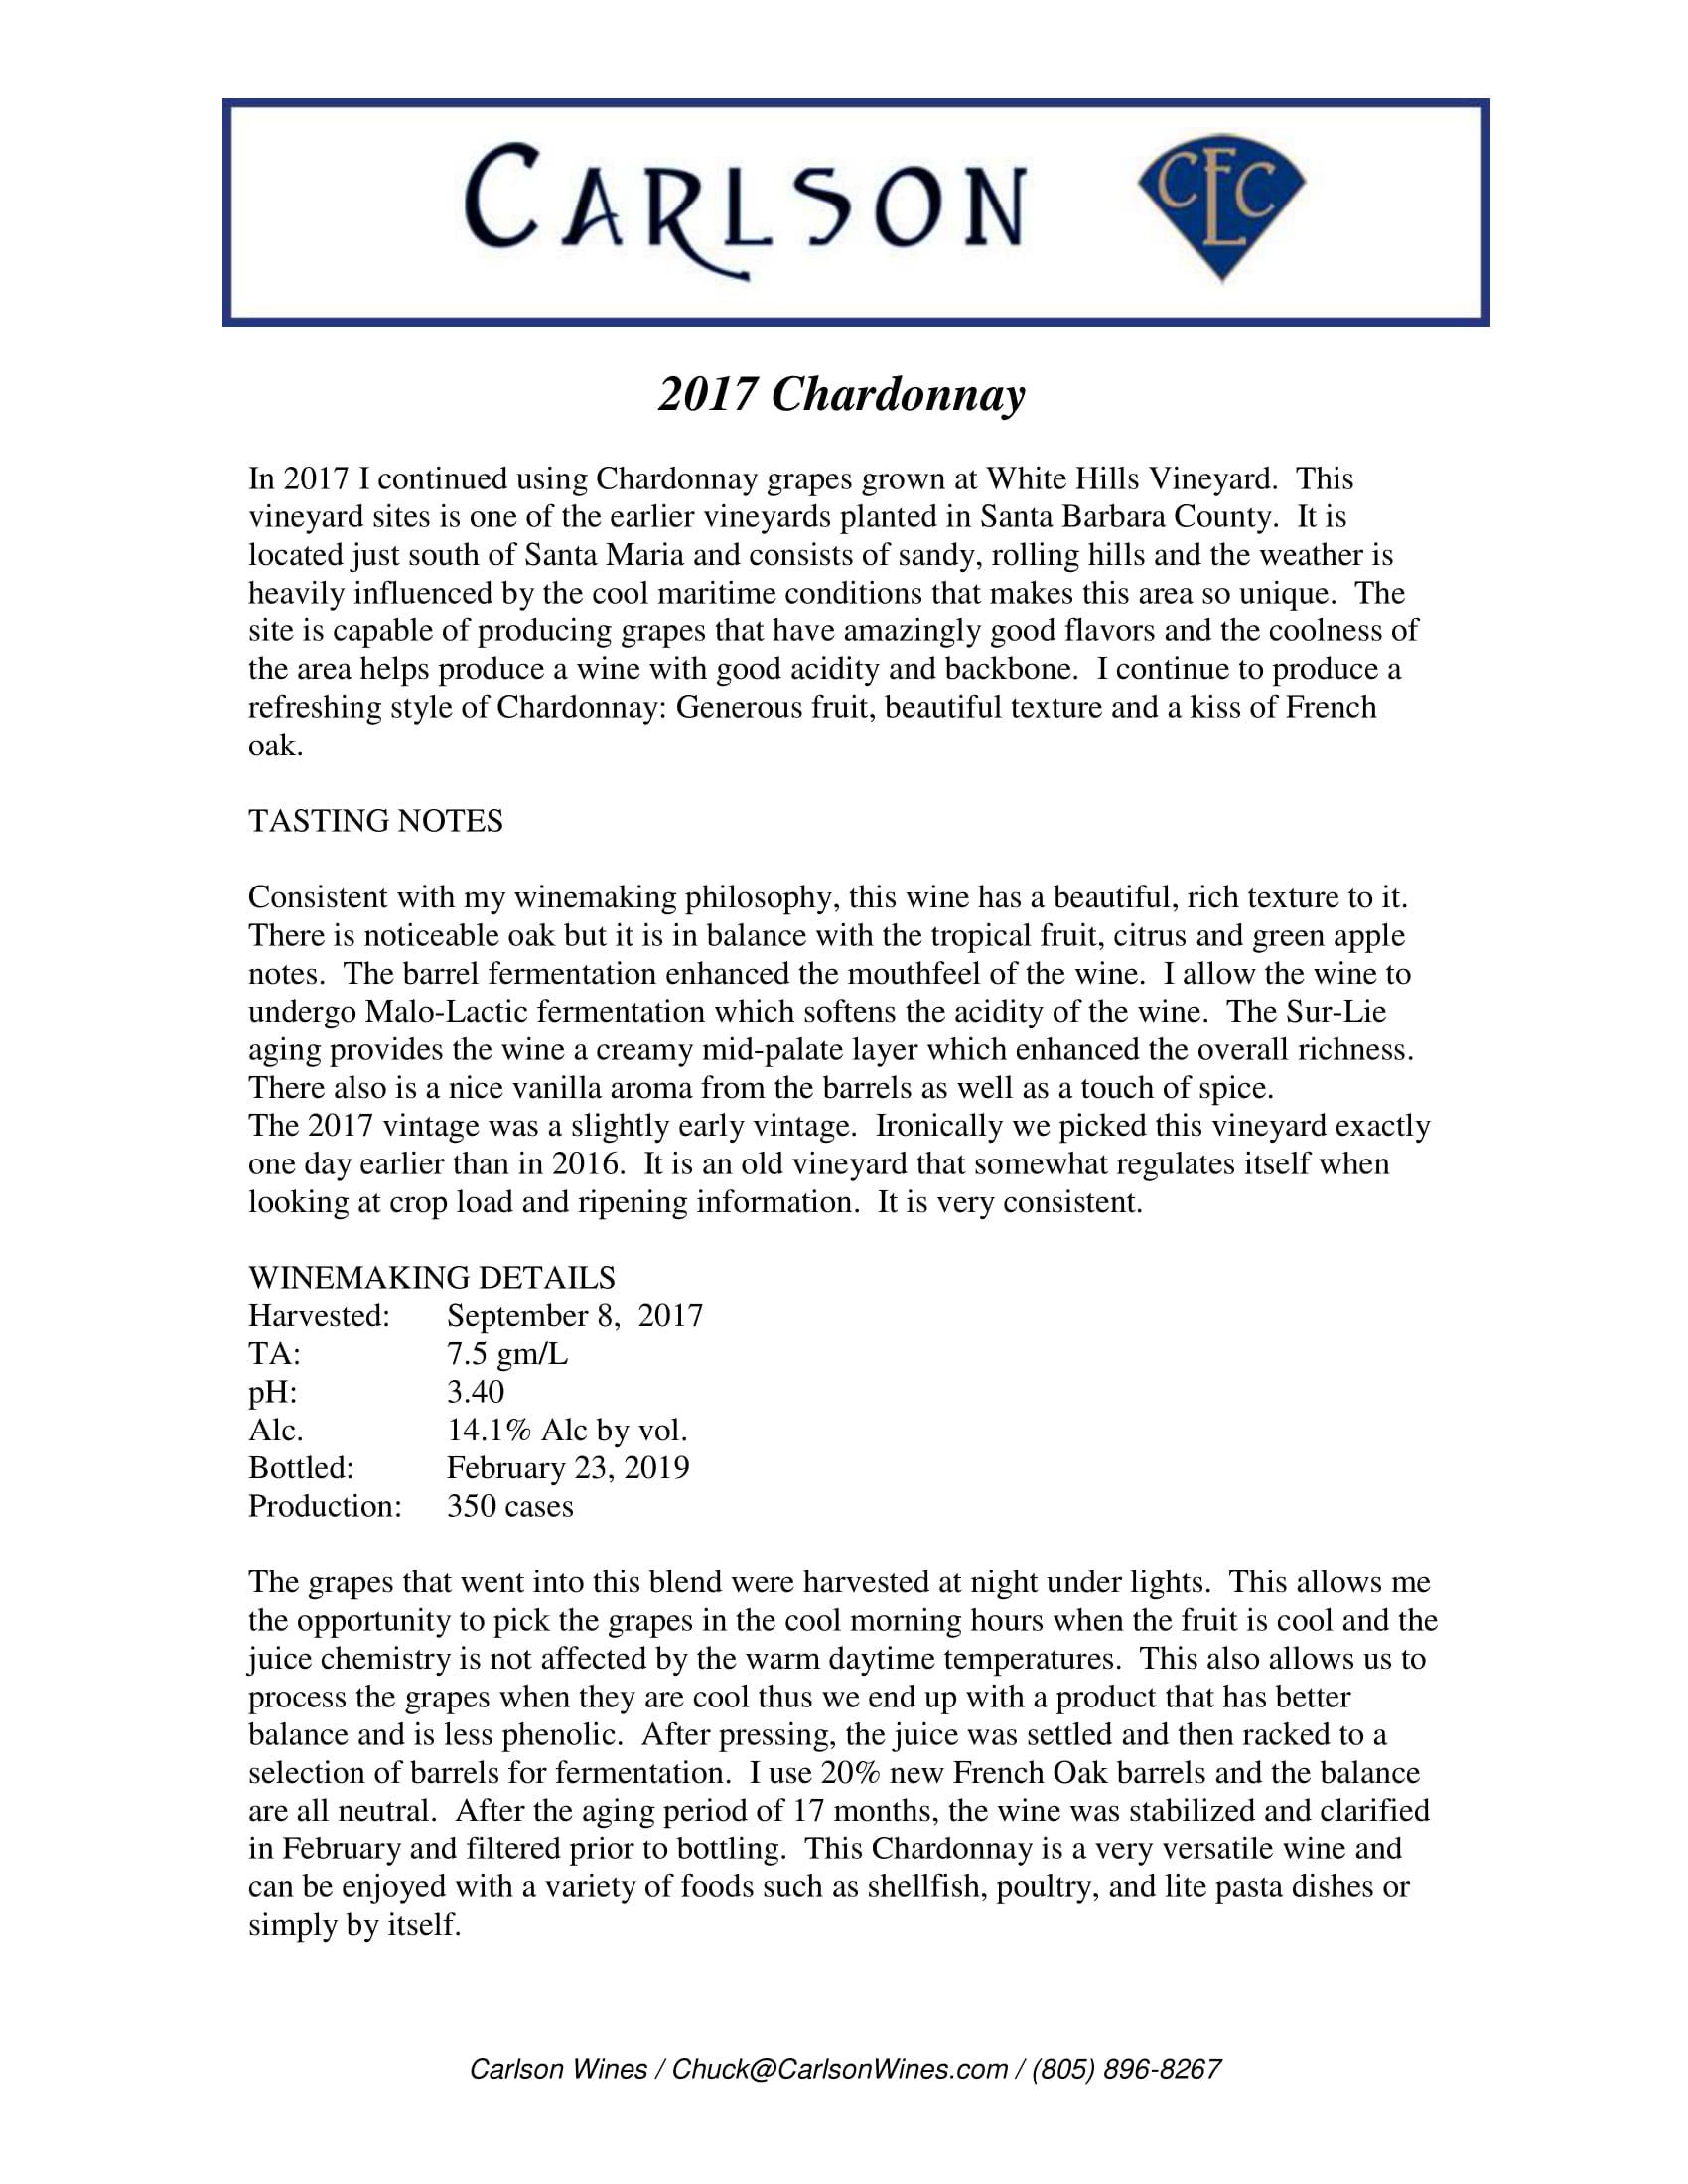 Carlson Chardonnay Tech Sheet